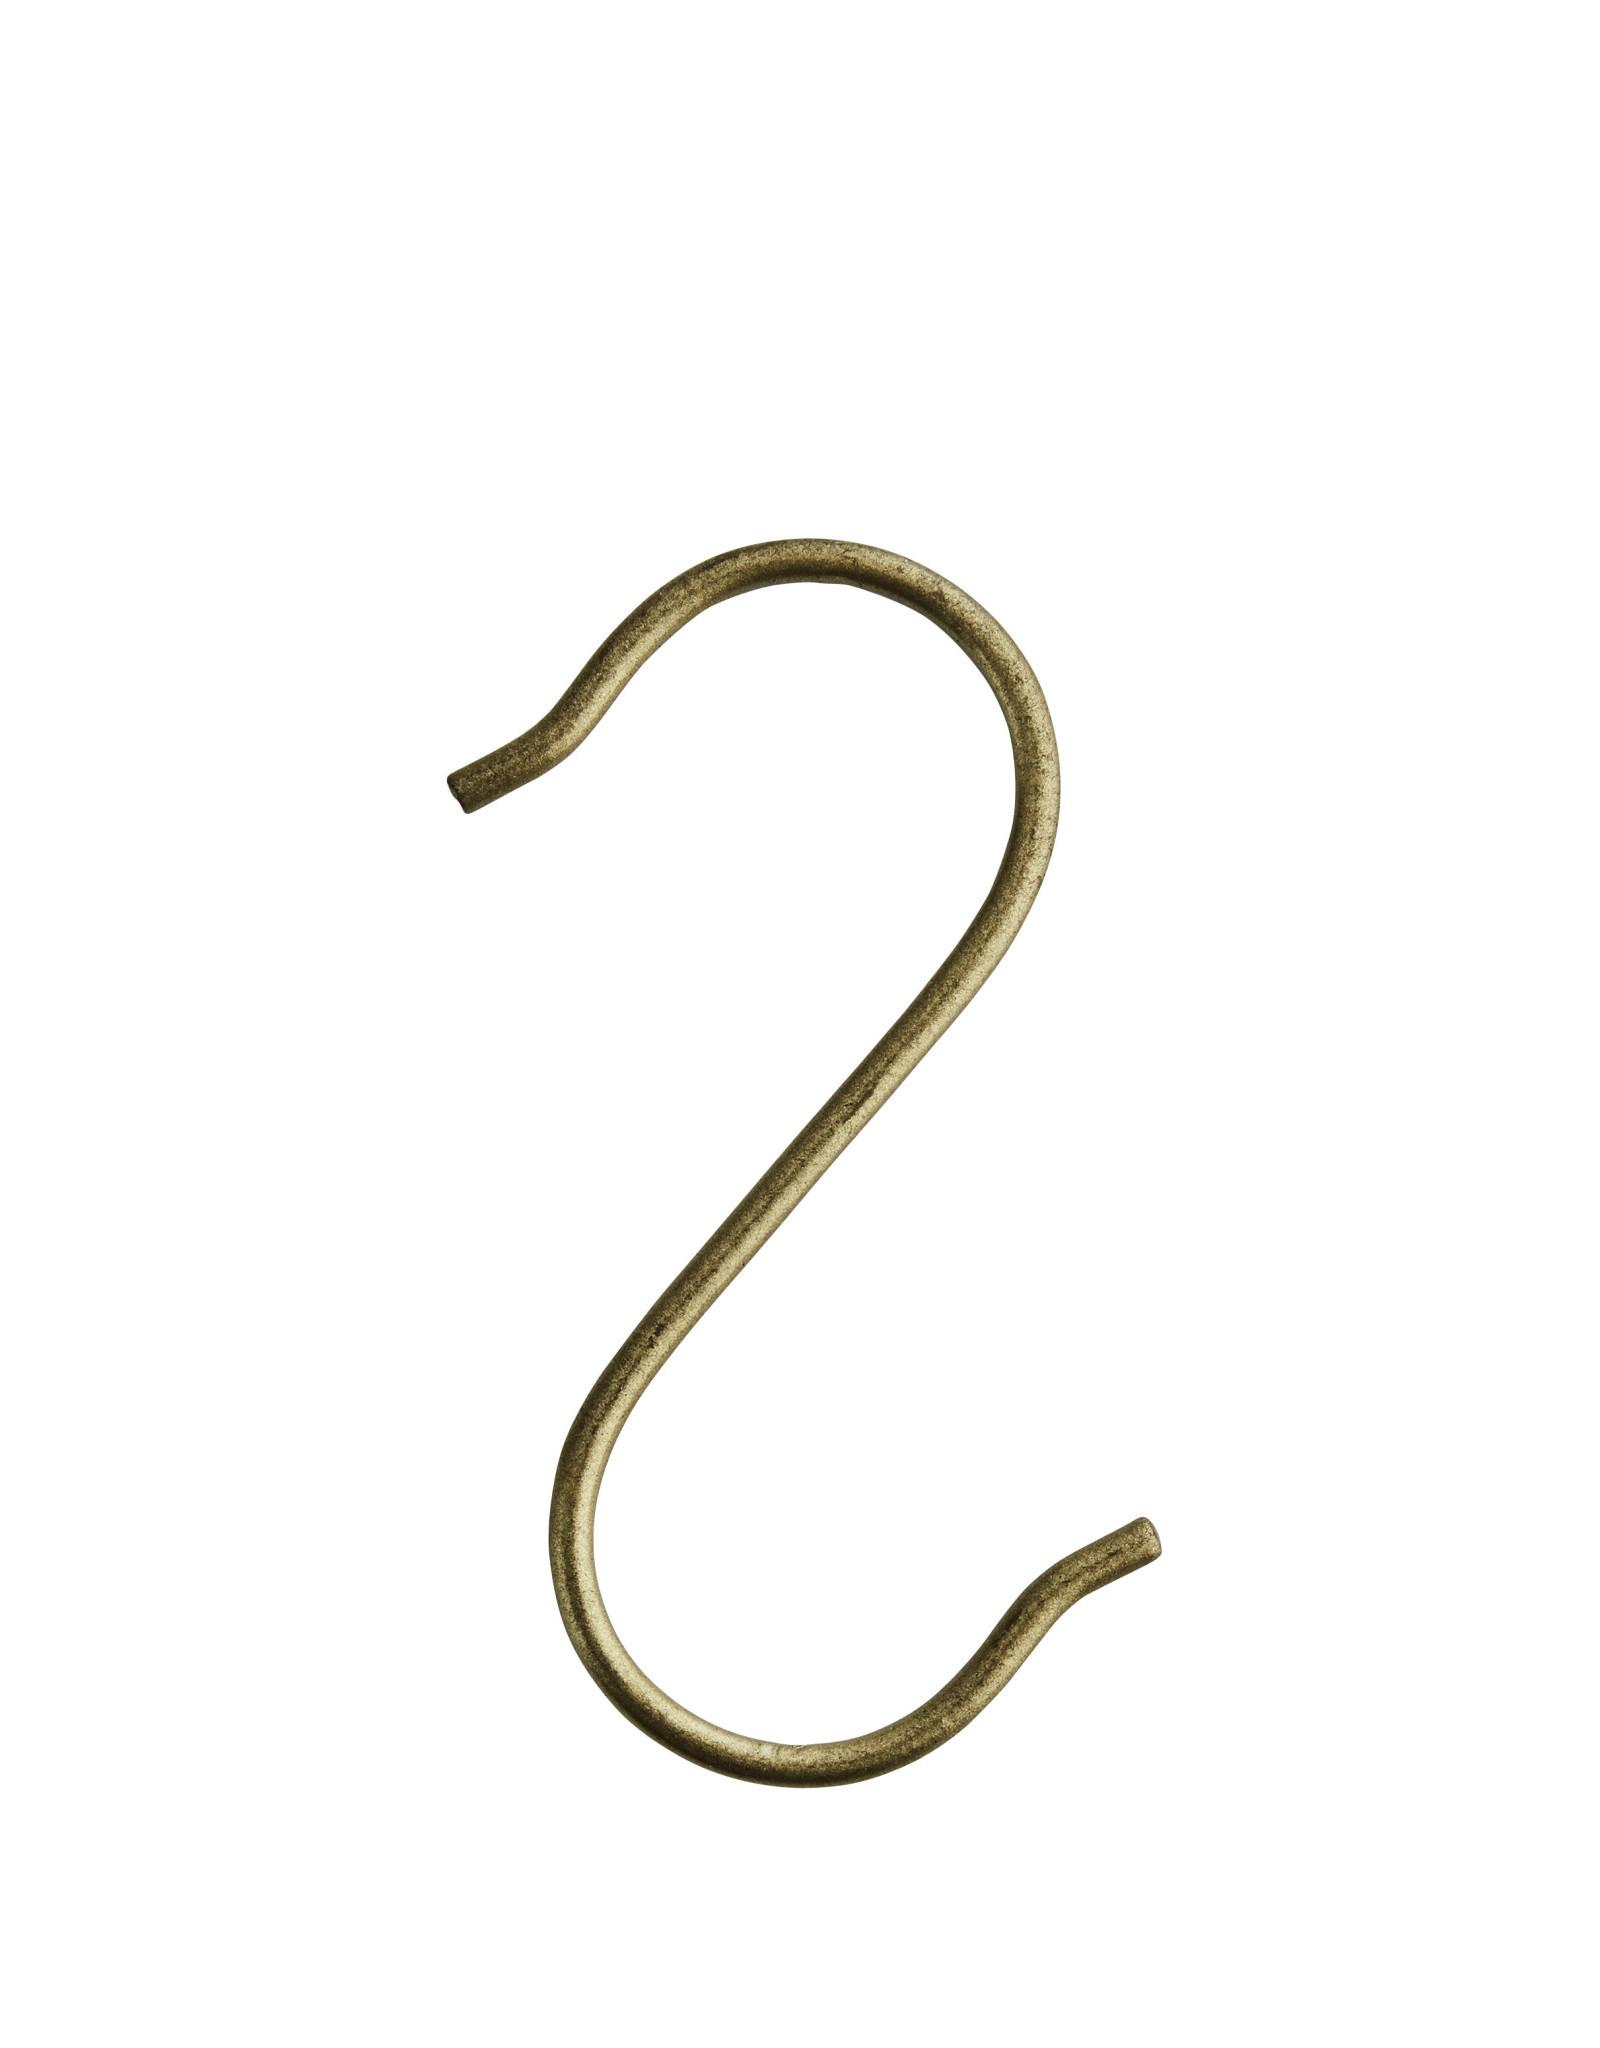 Madam Stoltz S-hook 11,5 x 4,5 cm - Iron - Brass [M]